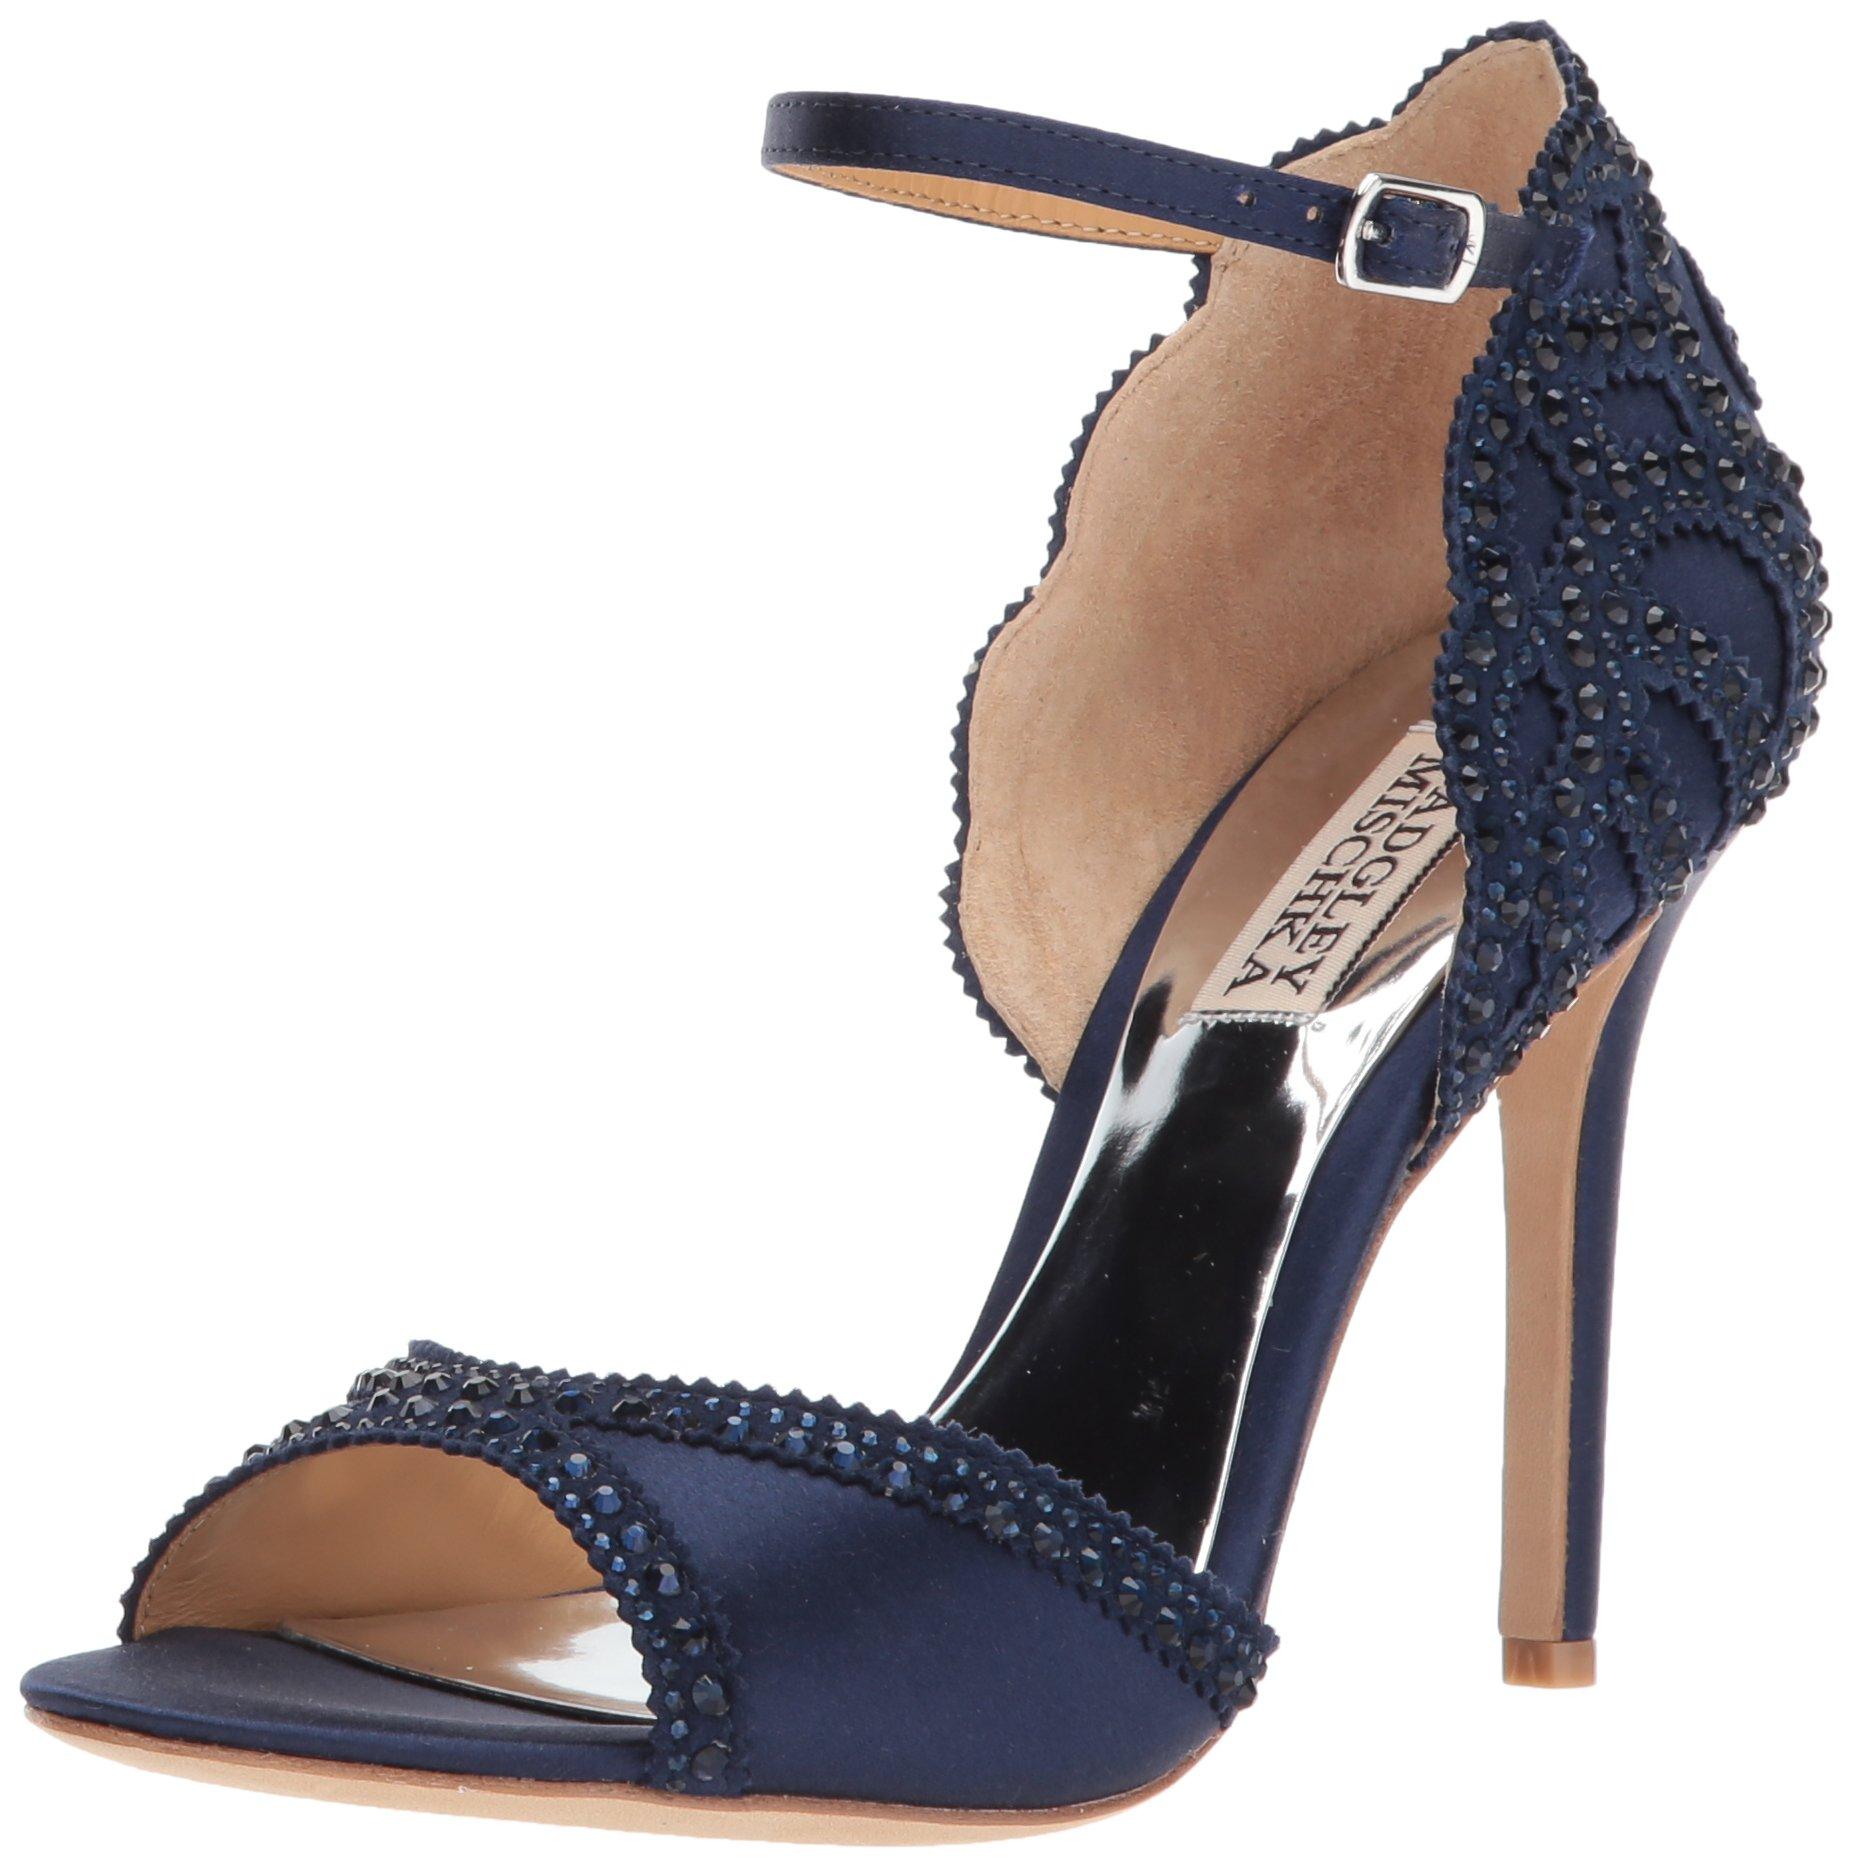 Badgley Mischka Women's Roxy Heeled Sandal, Midnight, 8 M US by Badgley Mischka